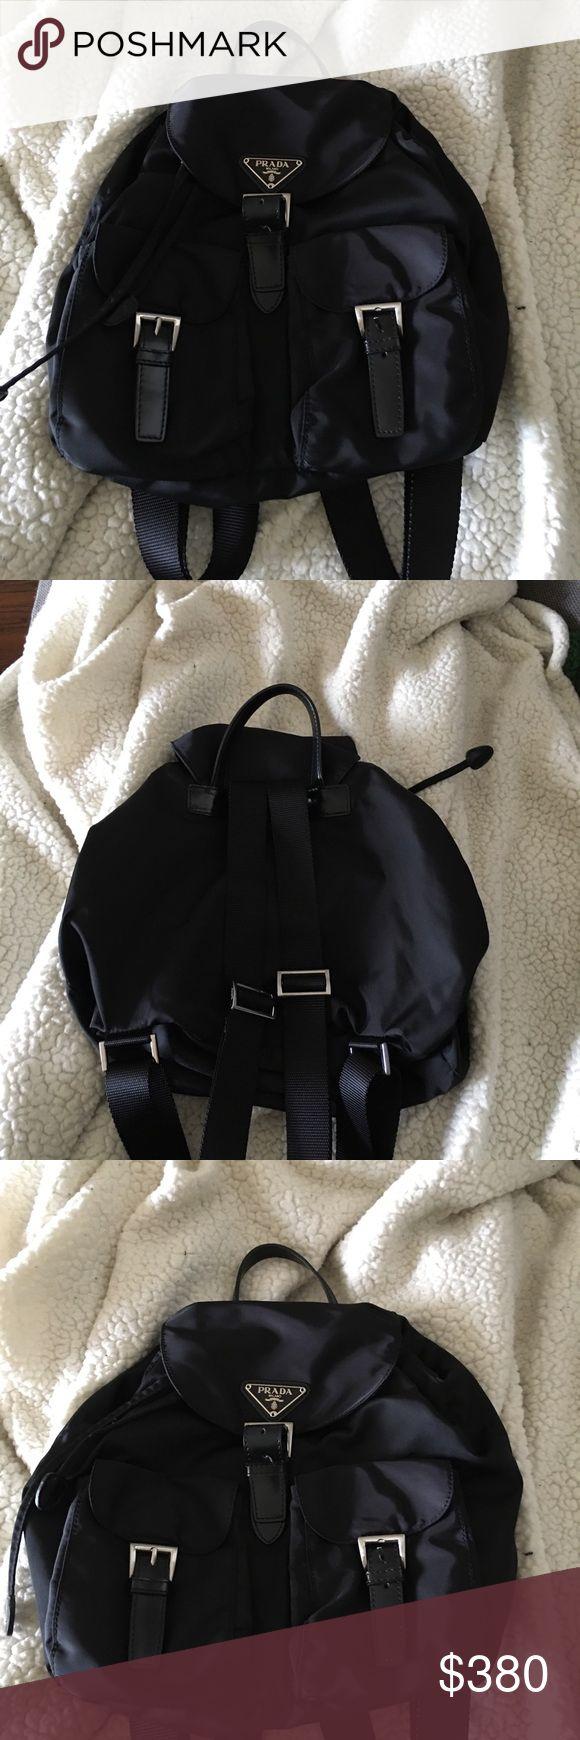 AUTHENTIC PRADA BACKPACK Vintage-SHEEN LIKE NEW PRADA Bags Backpacks